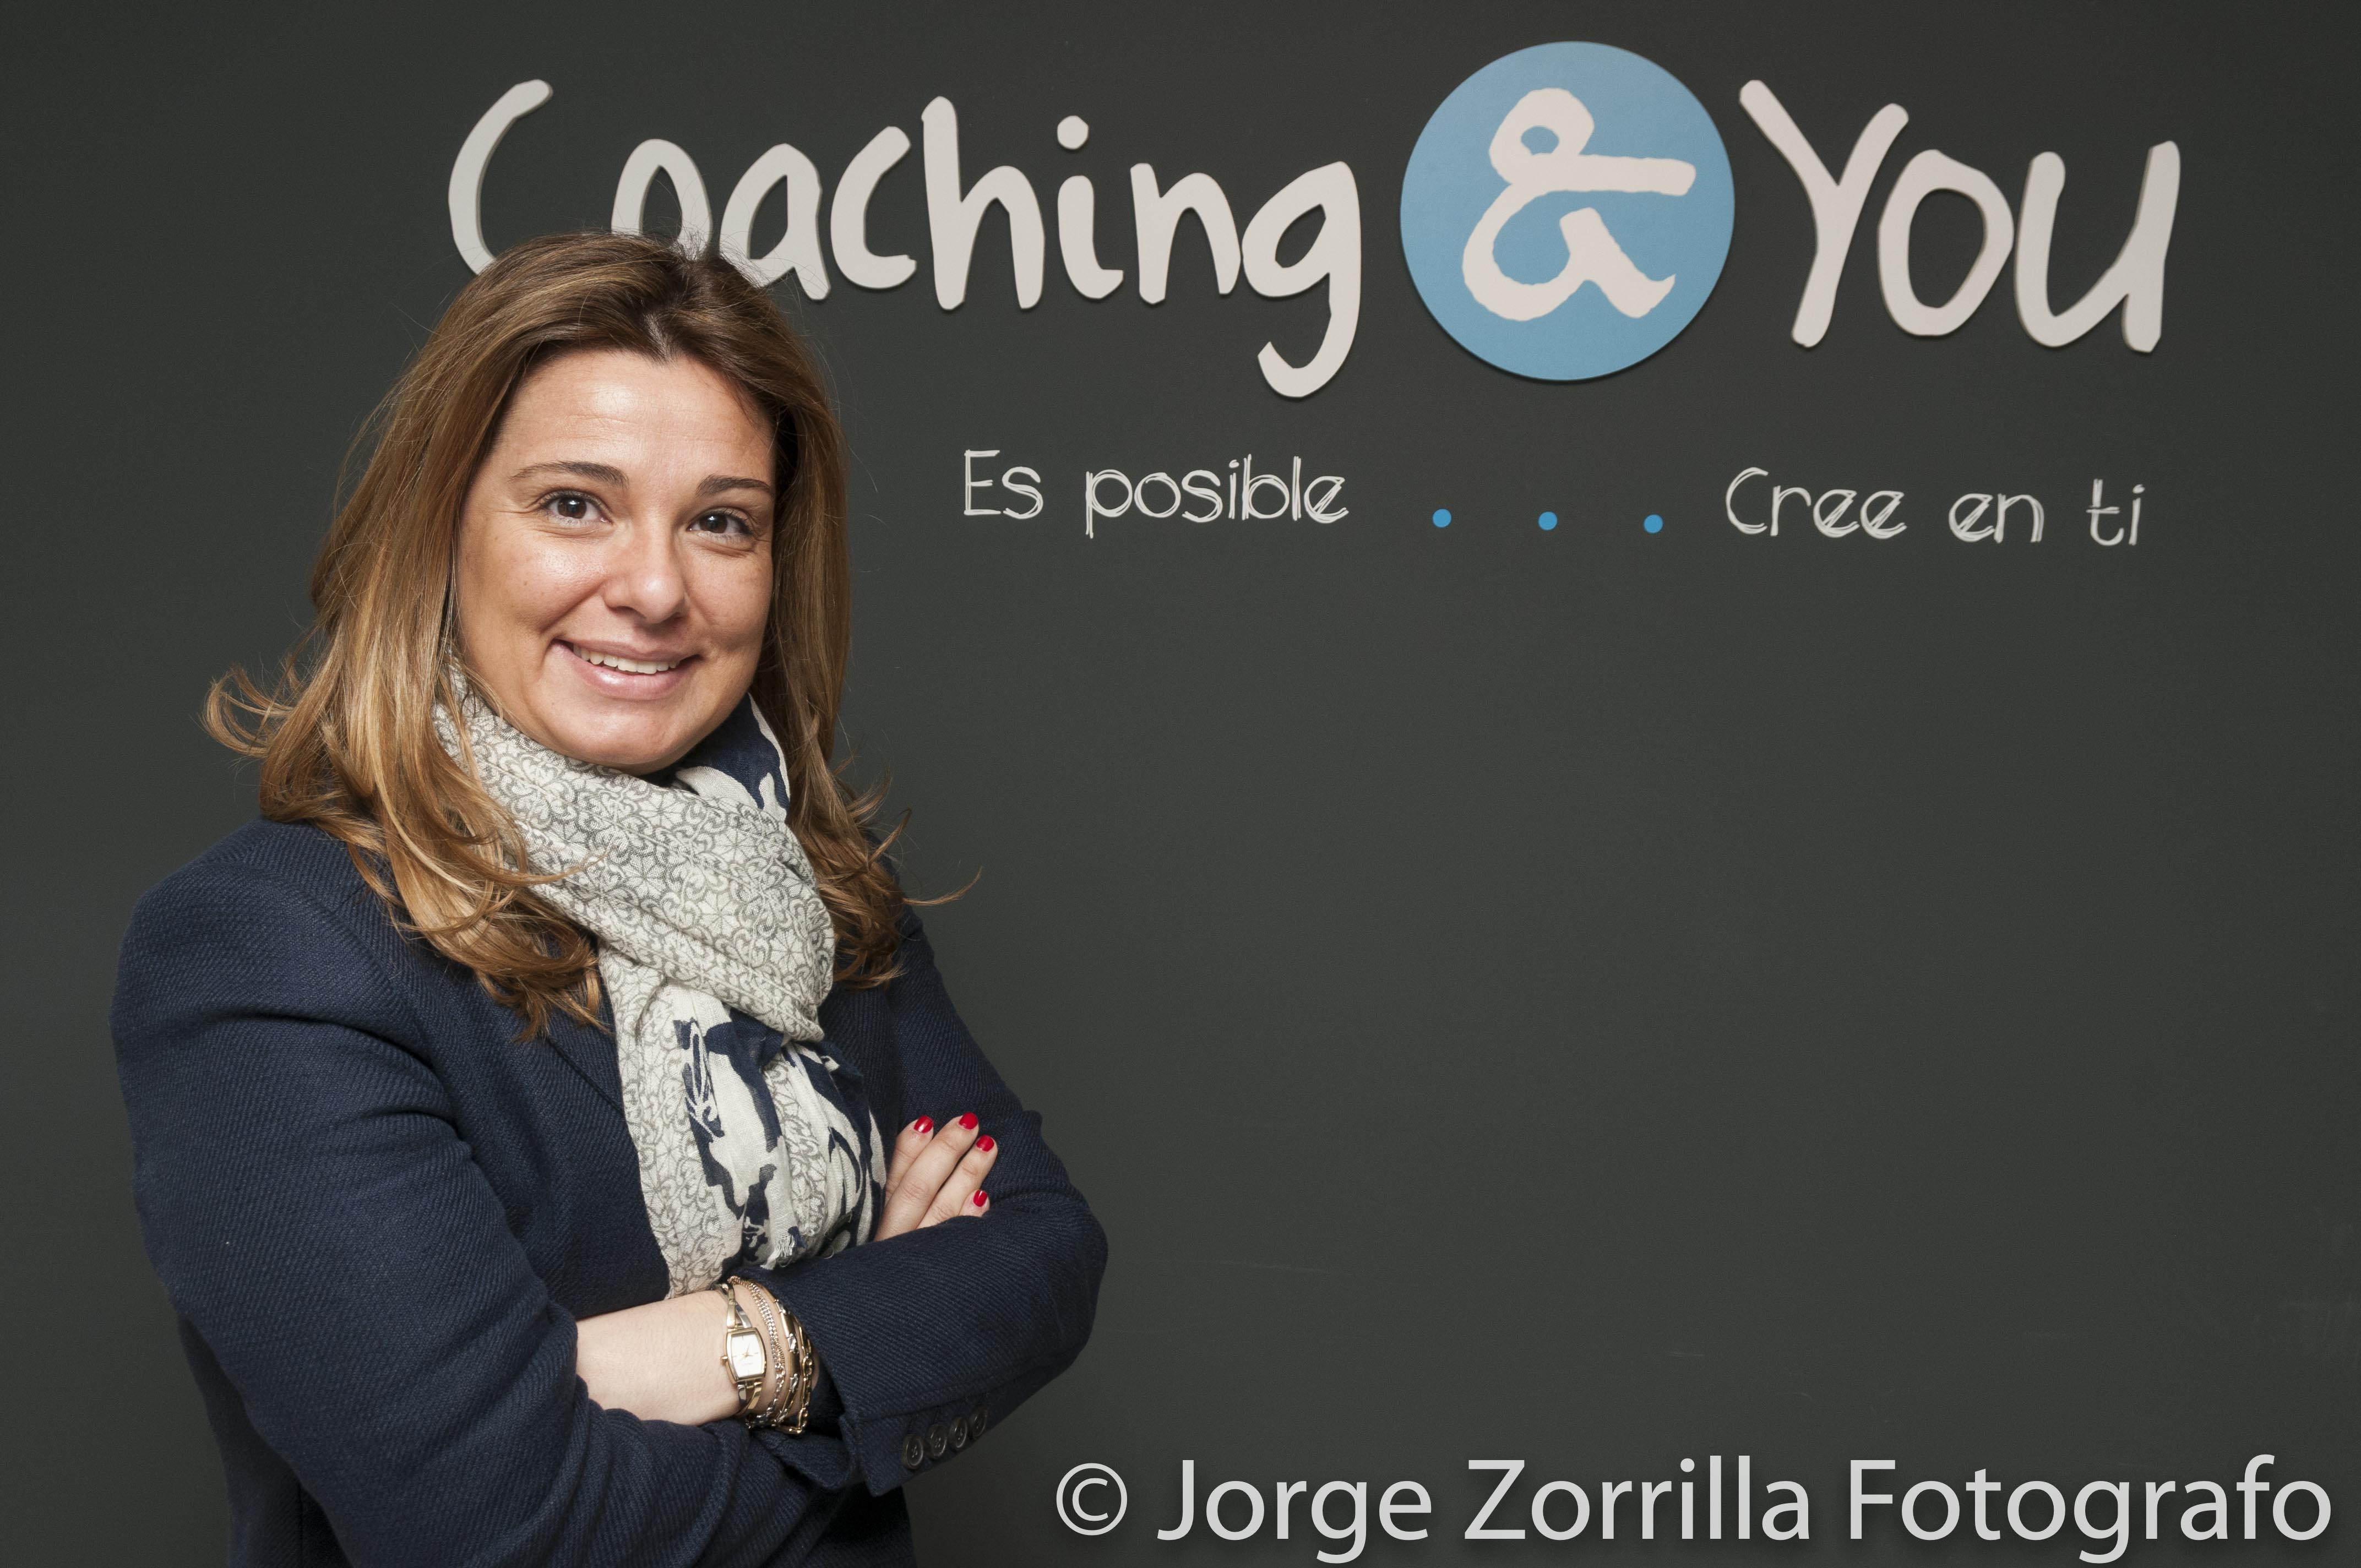 Fotografía Directivo Coaching and you © Jorge Zorrilla Fotógrafo Madrid